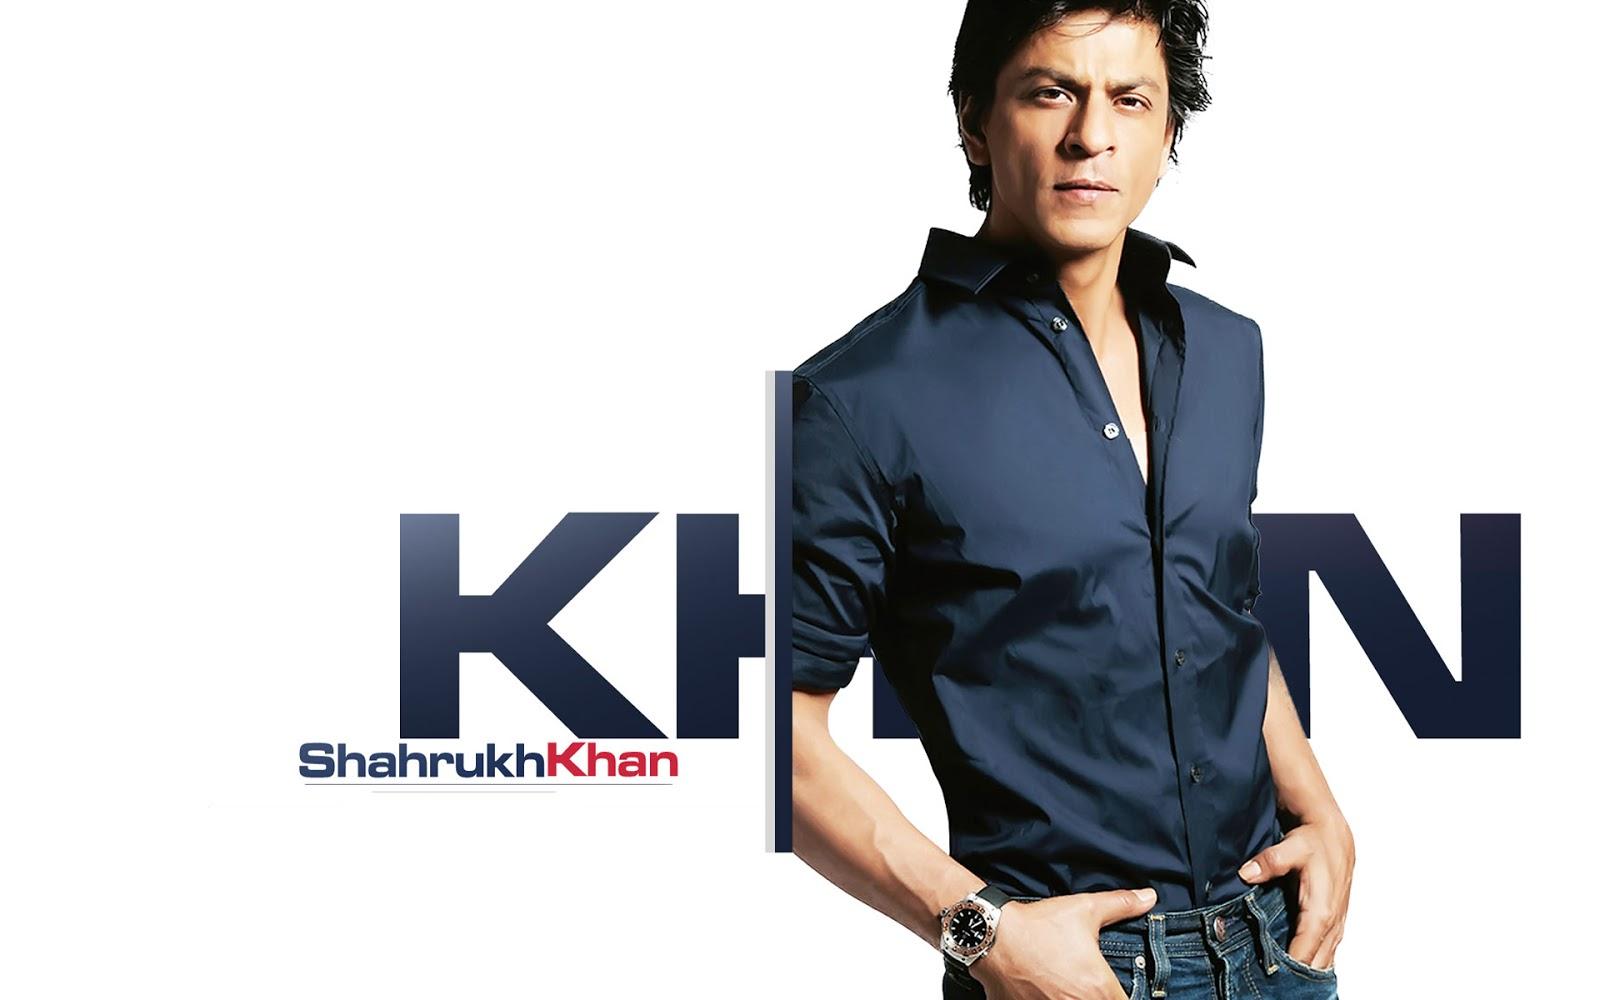 HD Wallpapers: Download Shahrukh Khan Wallpapers HD 2015